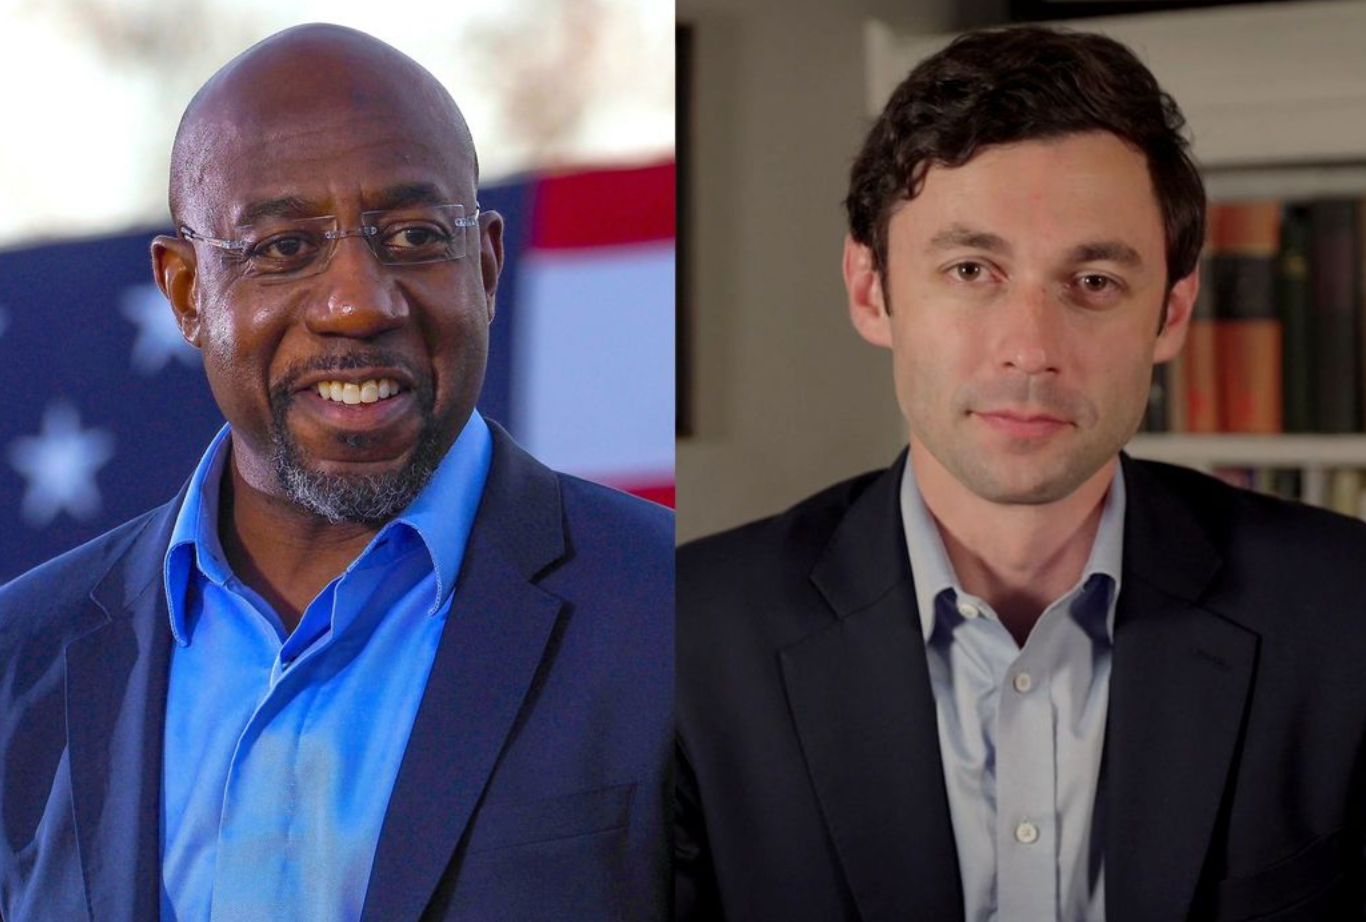 Democrats Take Senate Control With Georgia Wins